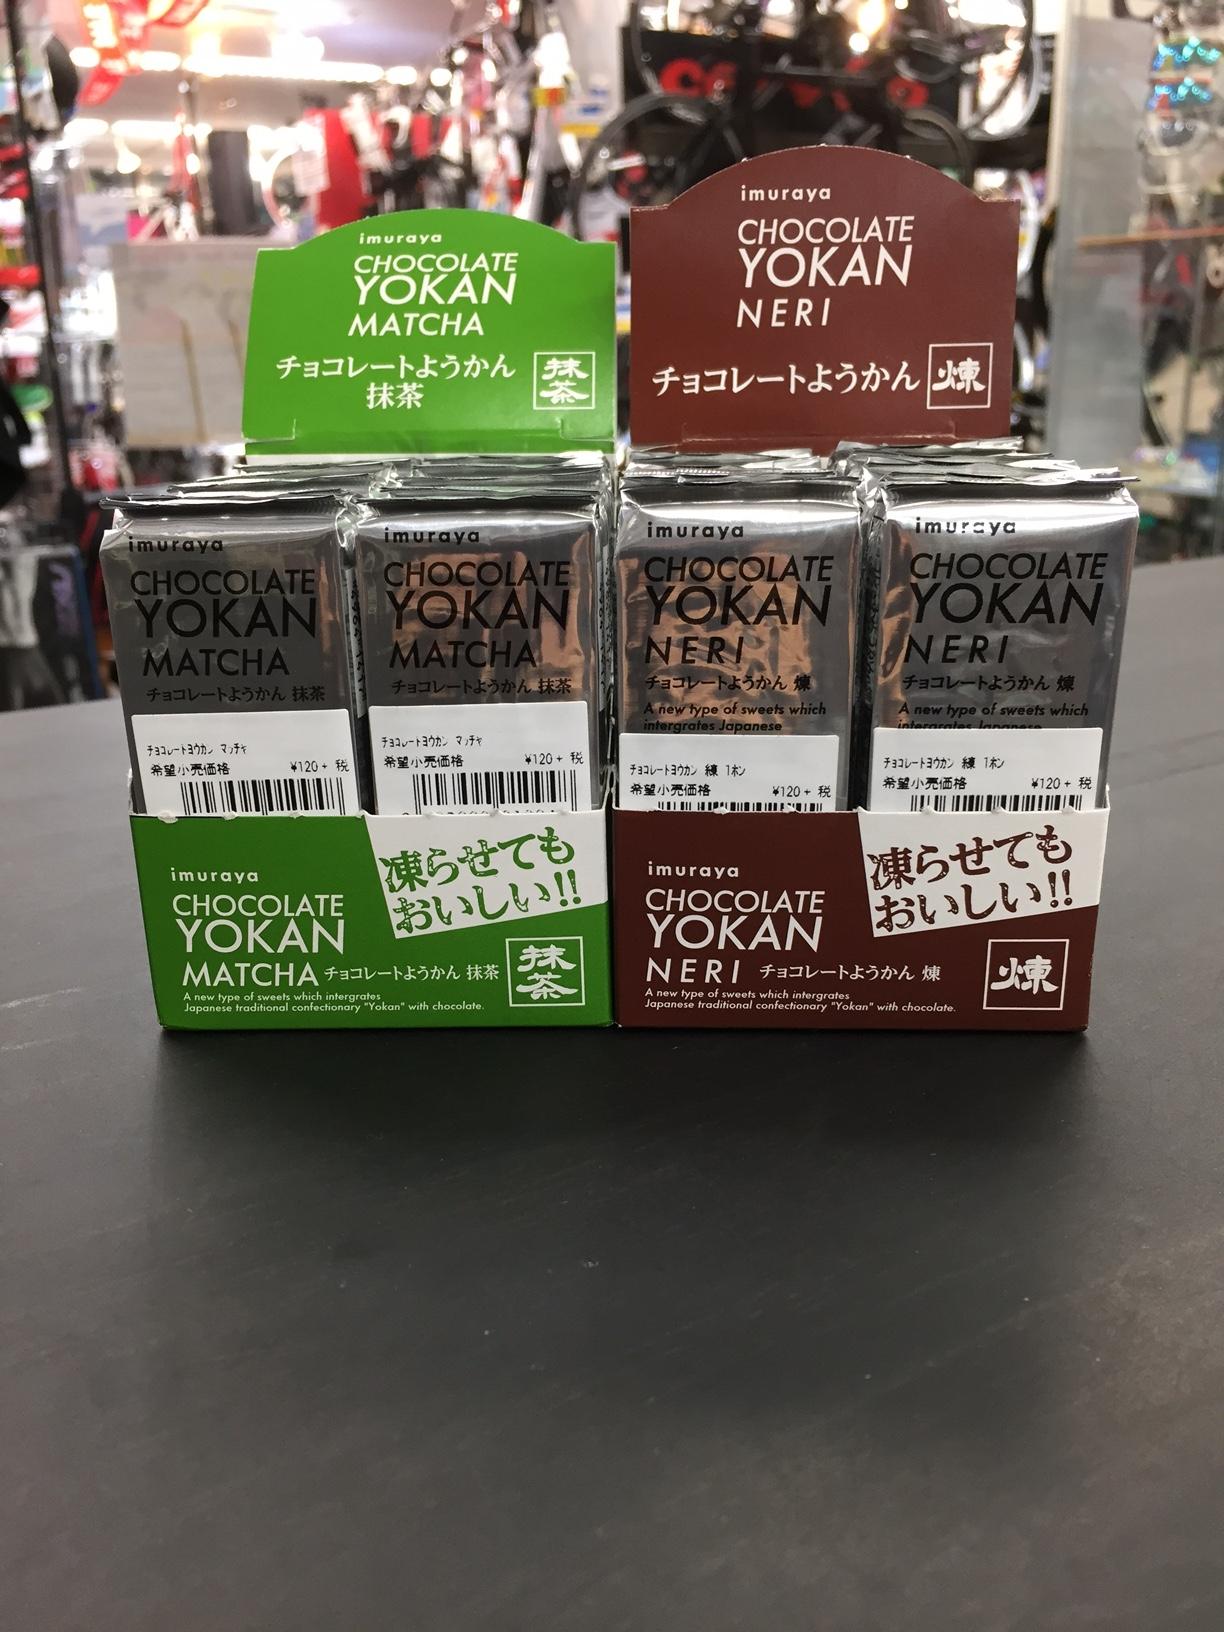 imuraya-choco-yokan-1.jpg